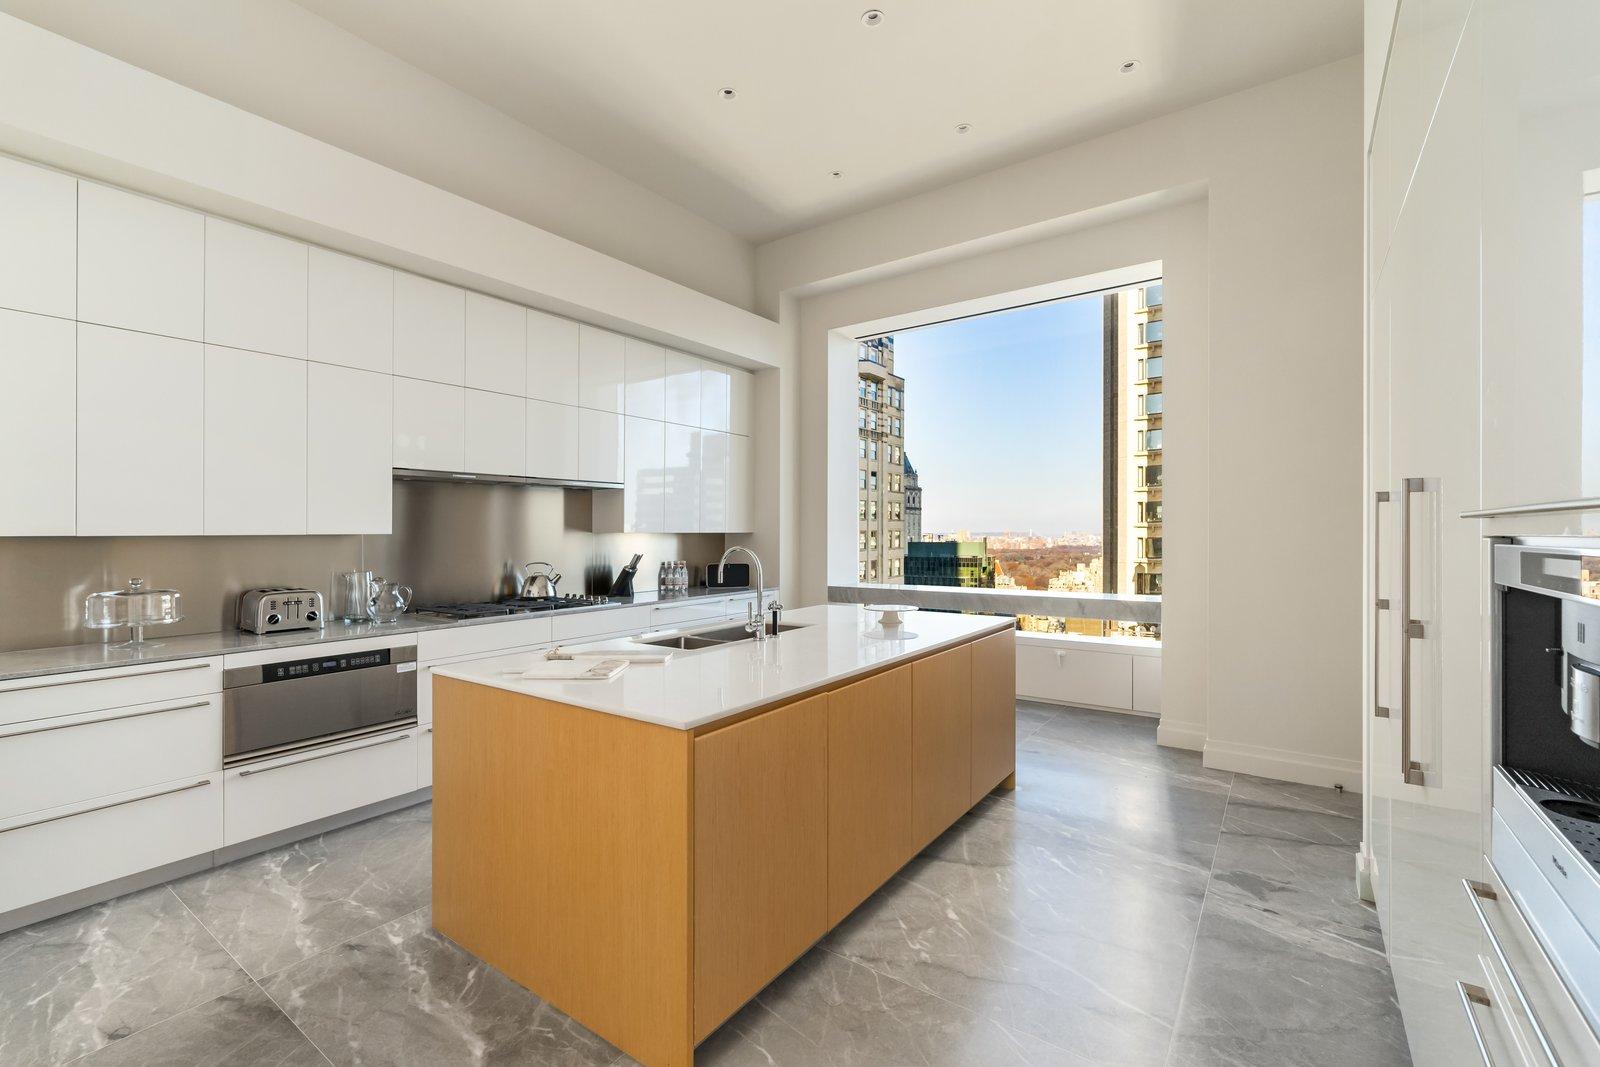 J.Lo and A-Rod's 432 Park Avenue apartment kitchen